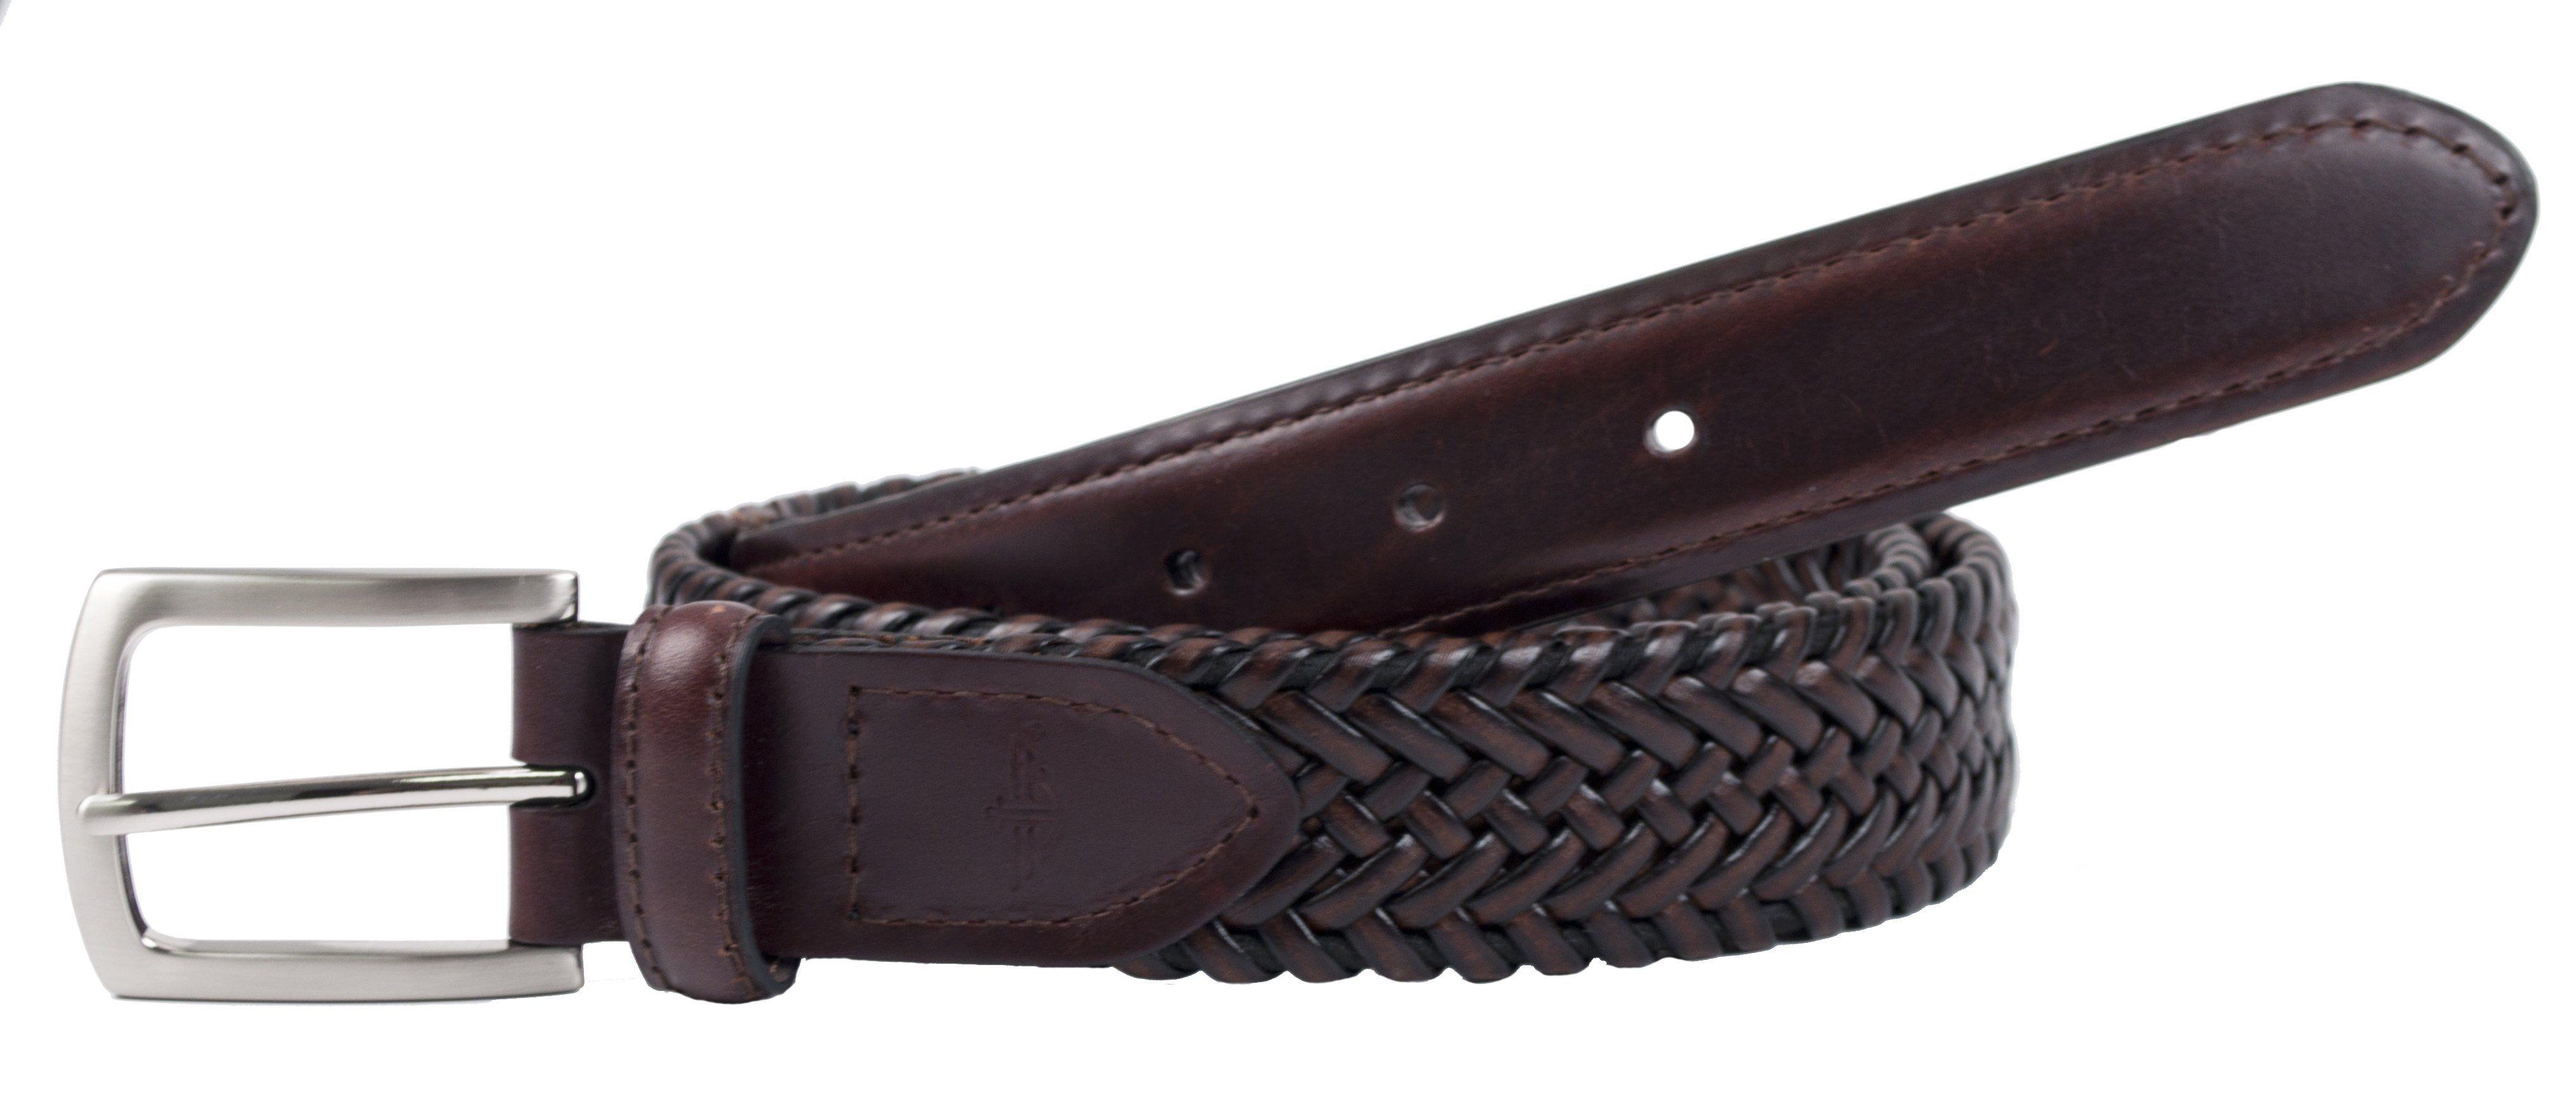 Dockers Men's Tubular Leather Stretch Belt Braided belt